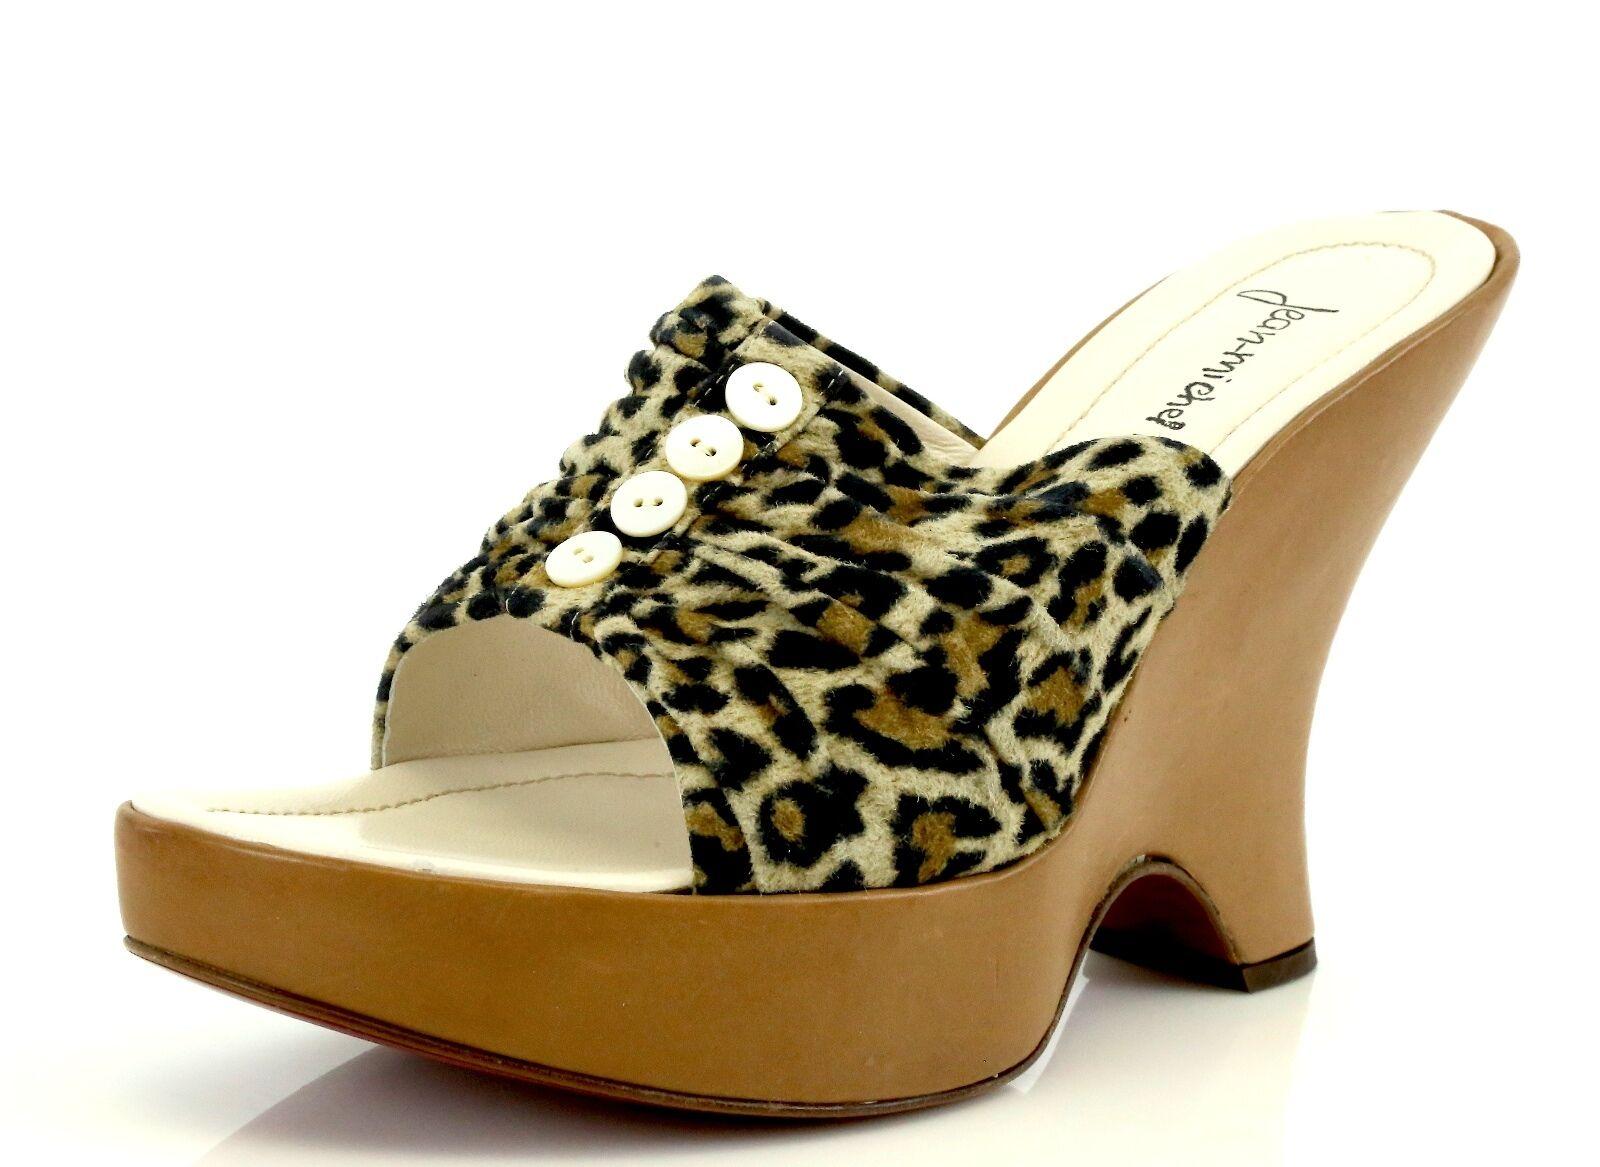 Jean-michel Cazabet Cheetah Print Wedge Mule Sandals 7380 Size 39 EU NEW!